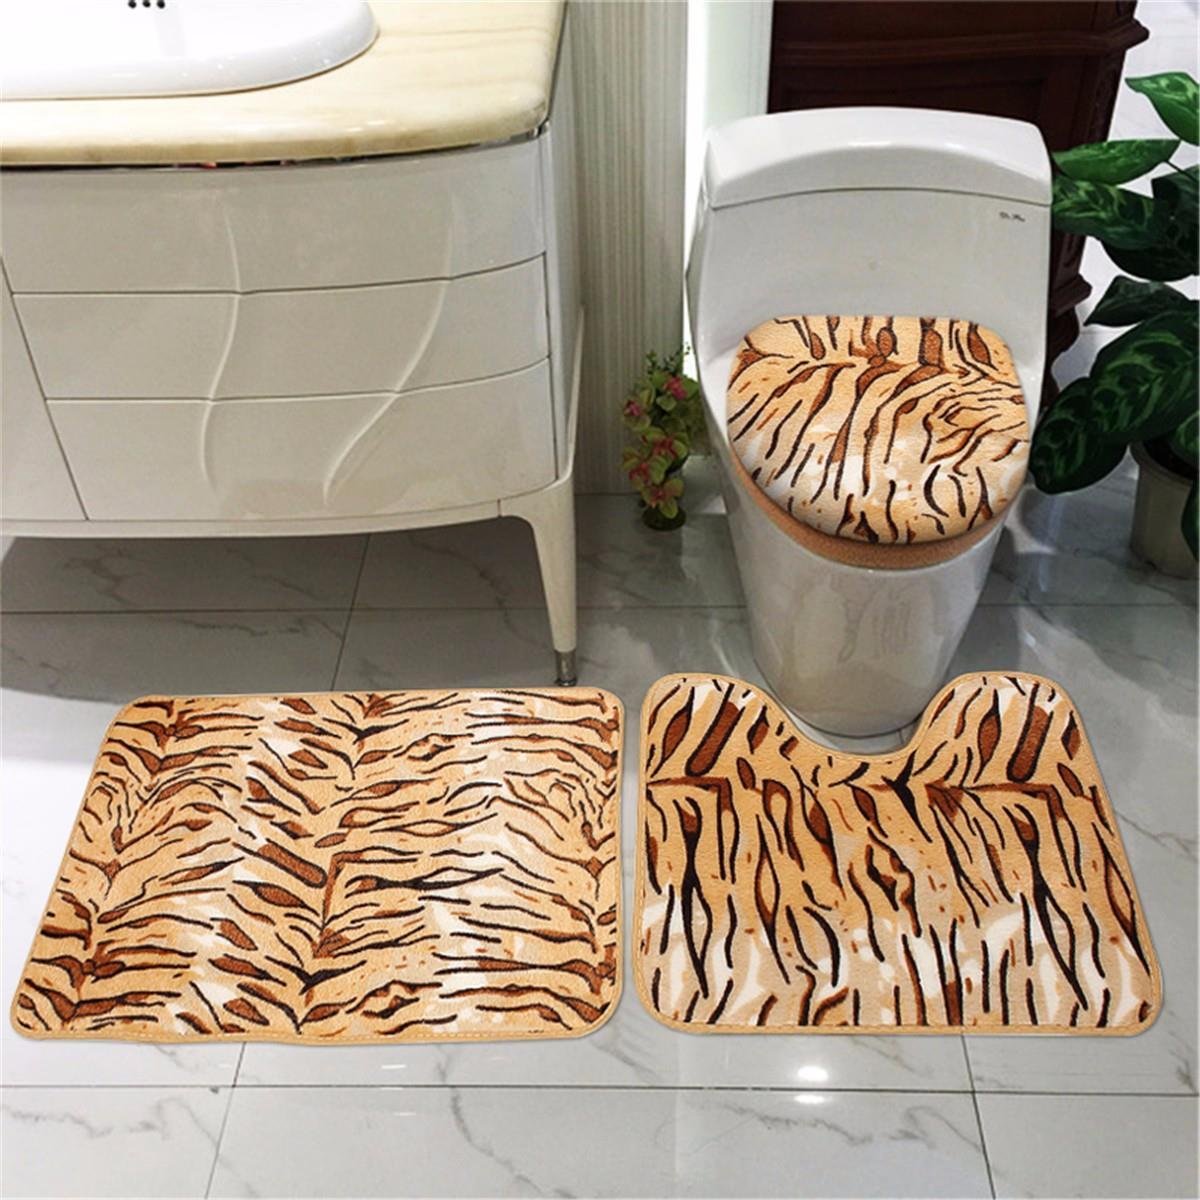 3Pcs Bathroom Mat Bath Rug Set Animal Skin Print Contour Mat Lid Cover  Washroom Foam Carpet Mesh Bathroom Toliet Rugs In Carpet From Home U0026 Garden  On ...